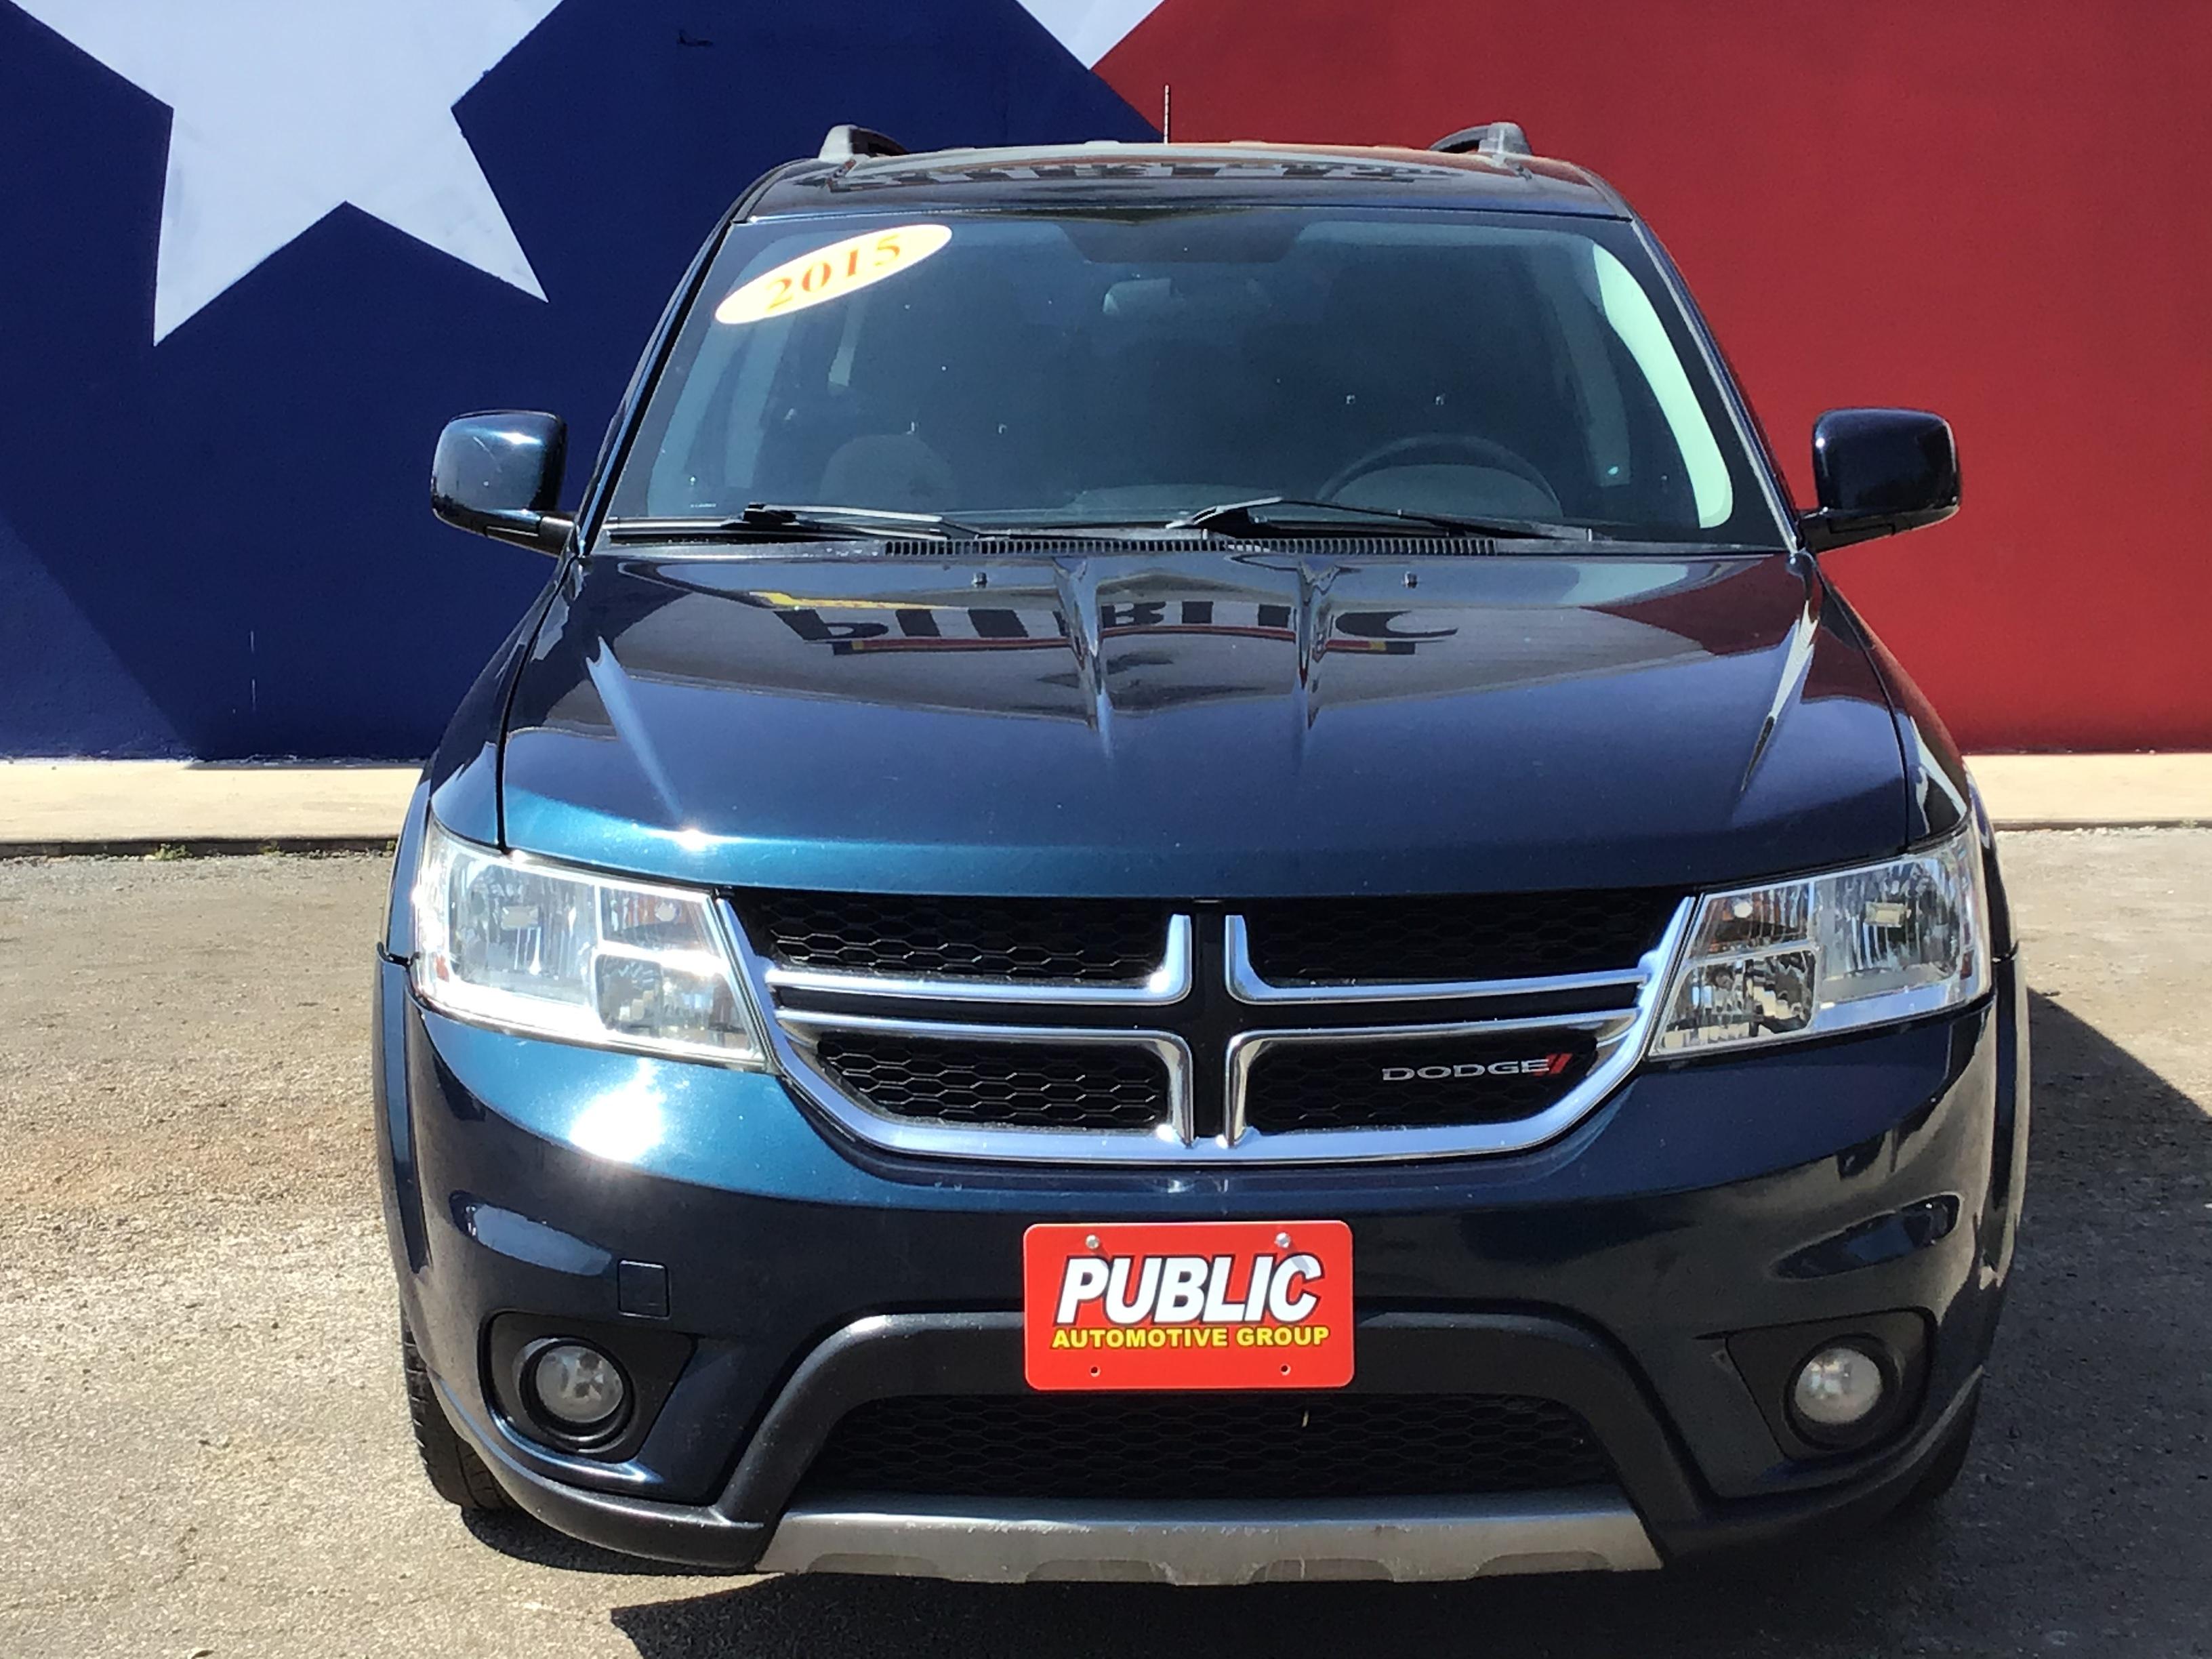 used vehicle - SUV DODGE JOURNEY 2015